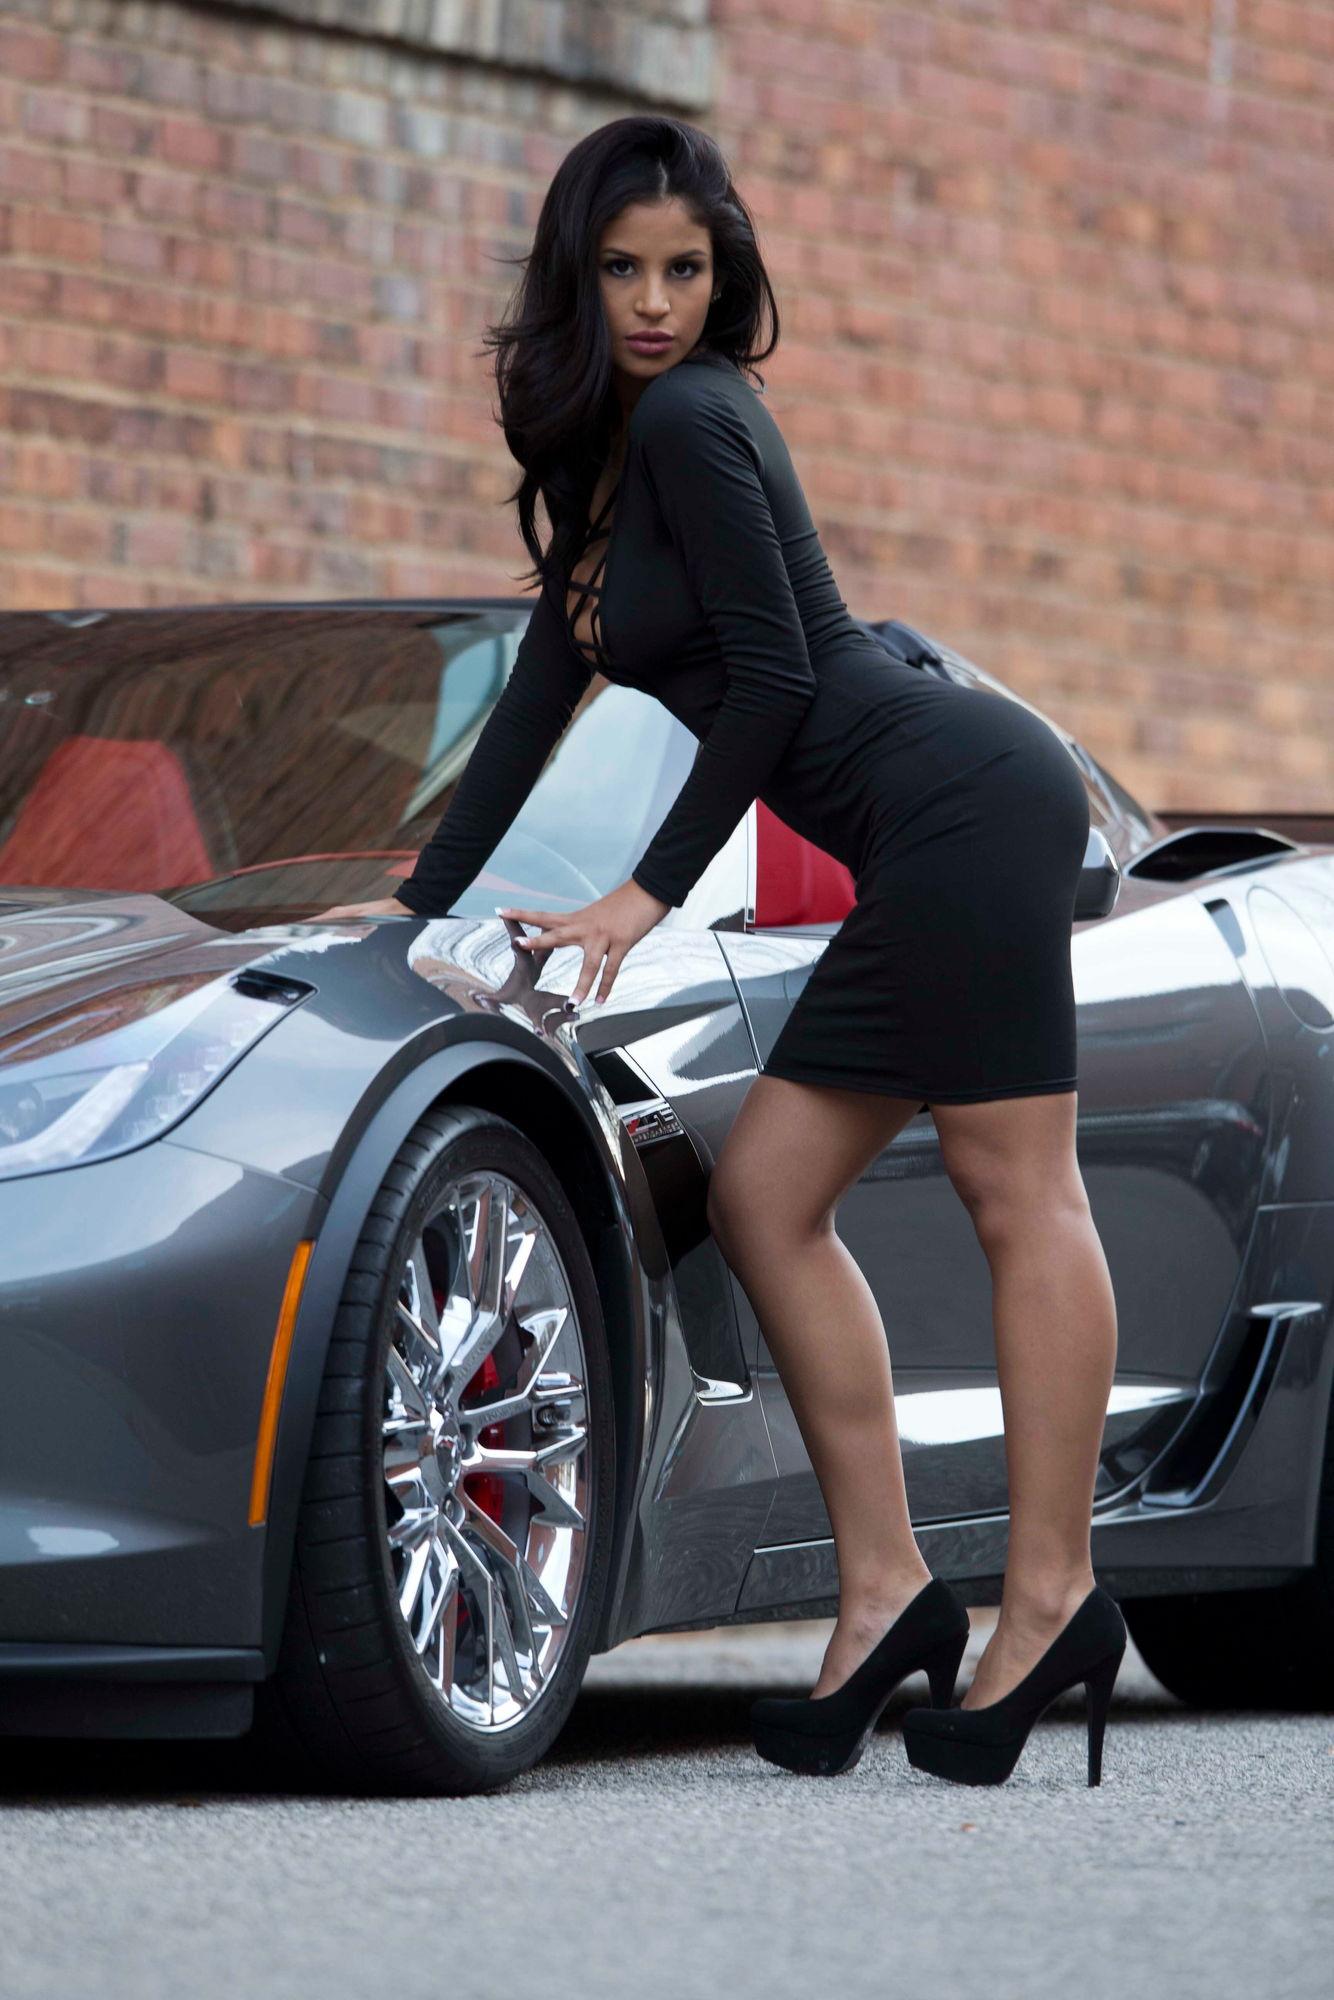 my shark grey z06 with sexy latina model - corvetteforum - chevrolet